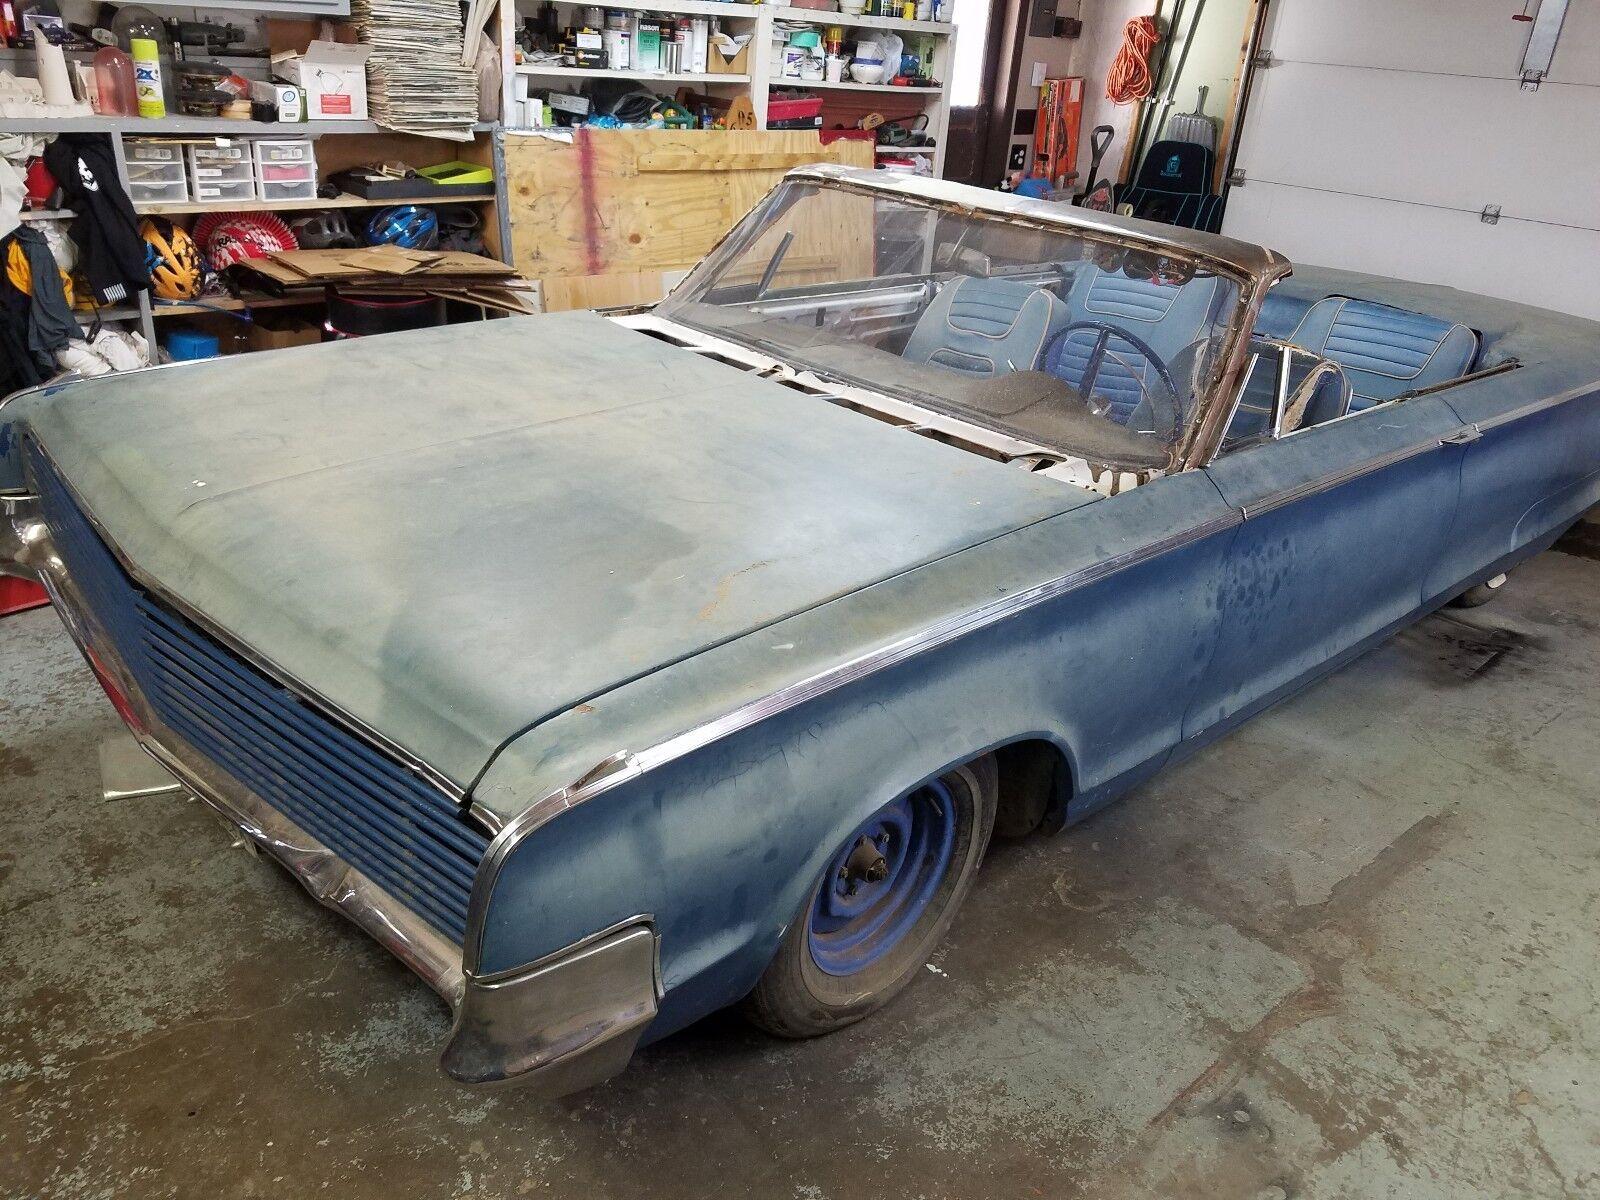 1965 Chrysler 300 Series  Rebuilt 383 Engine and Transmission